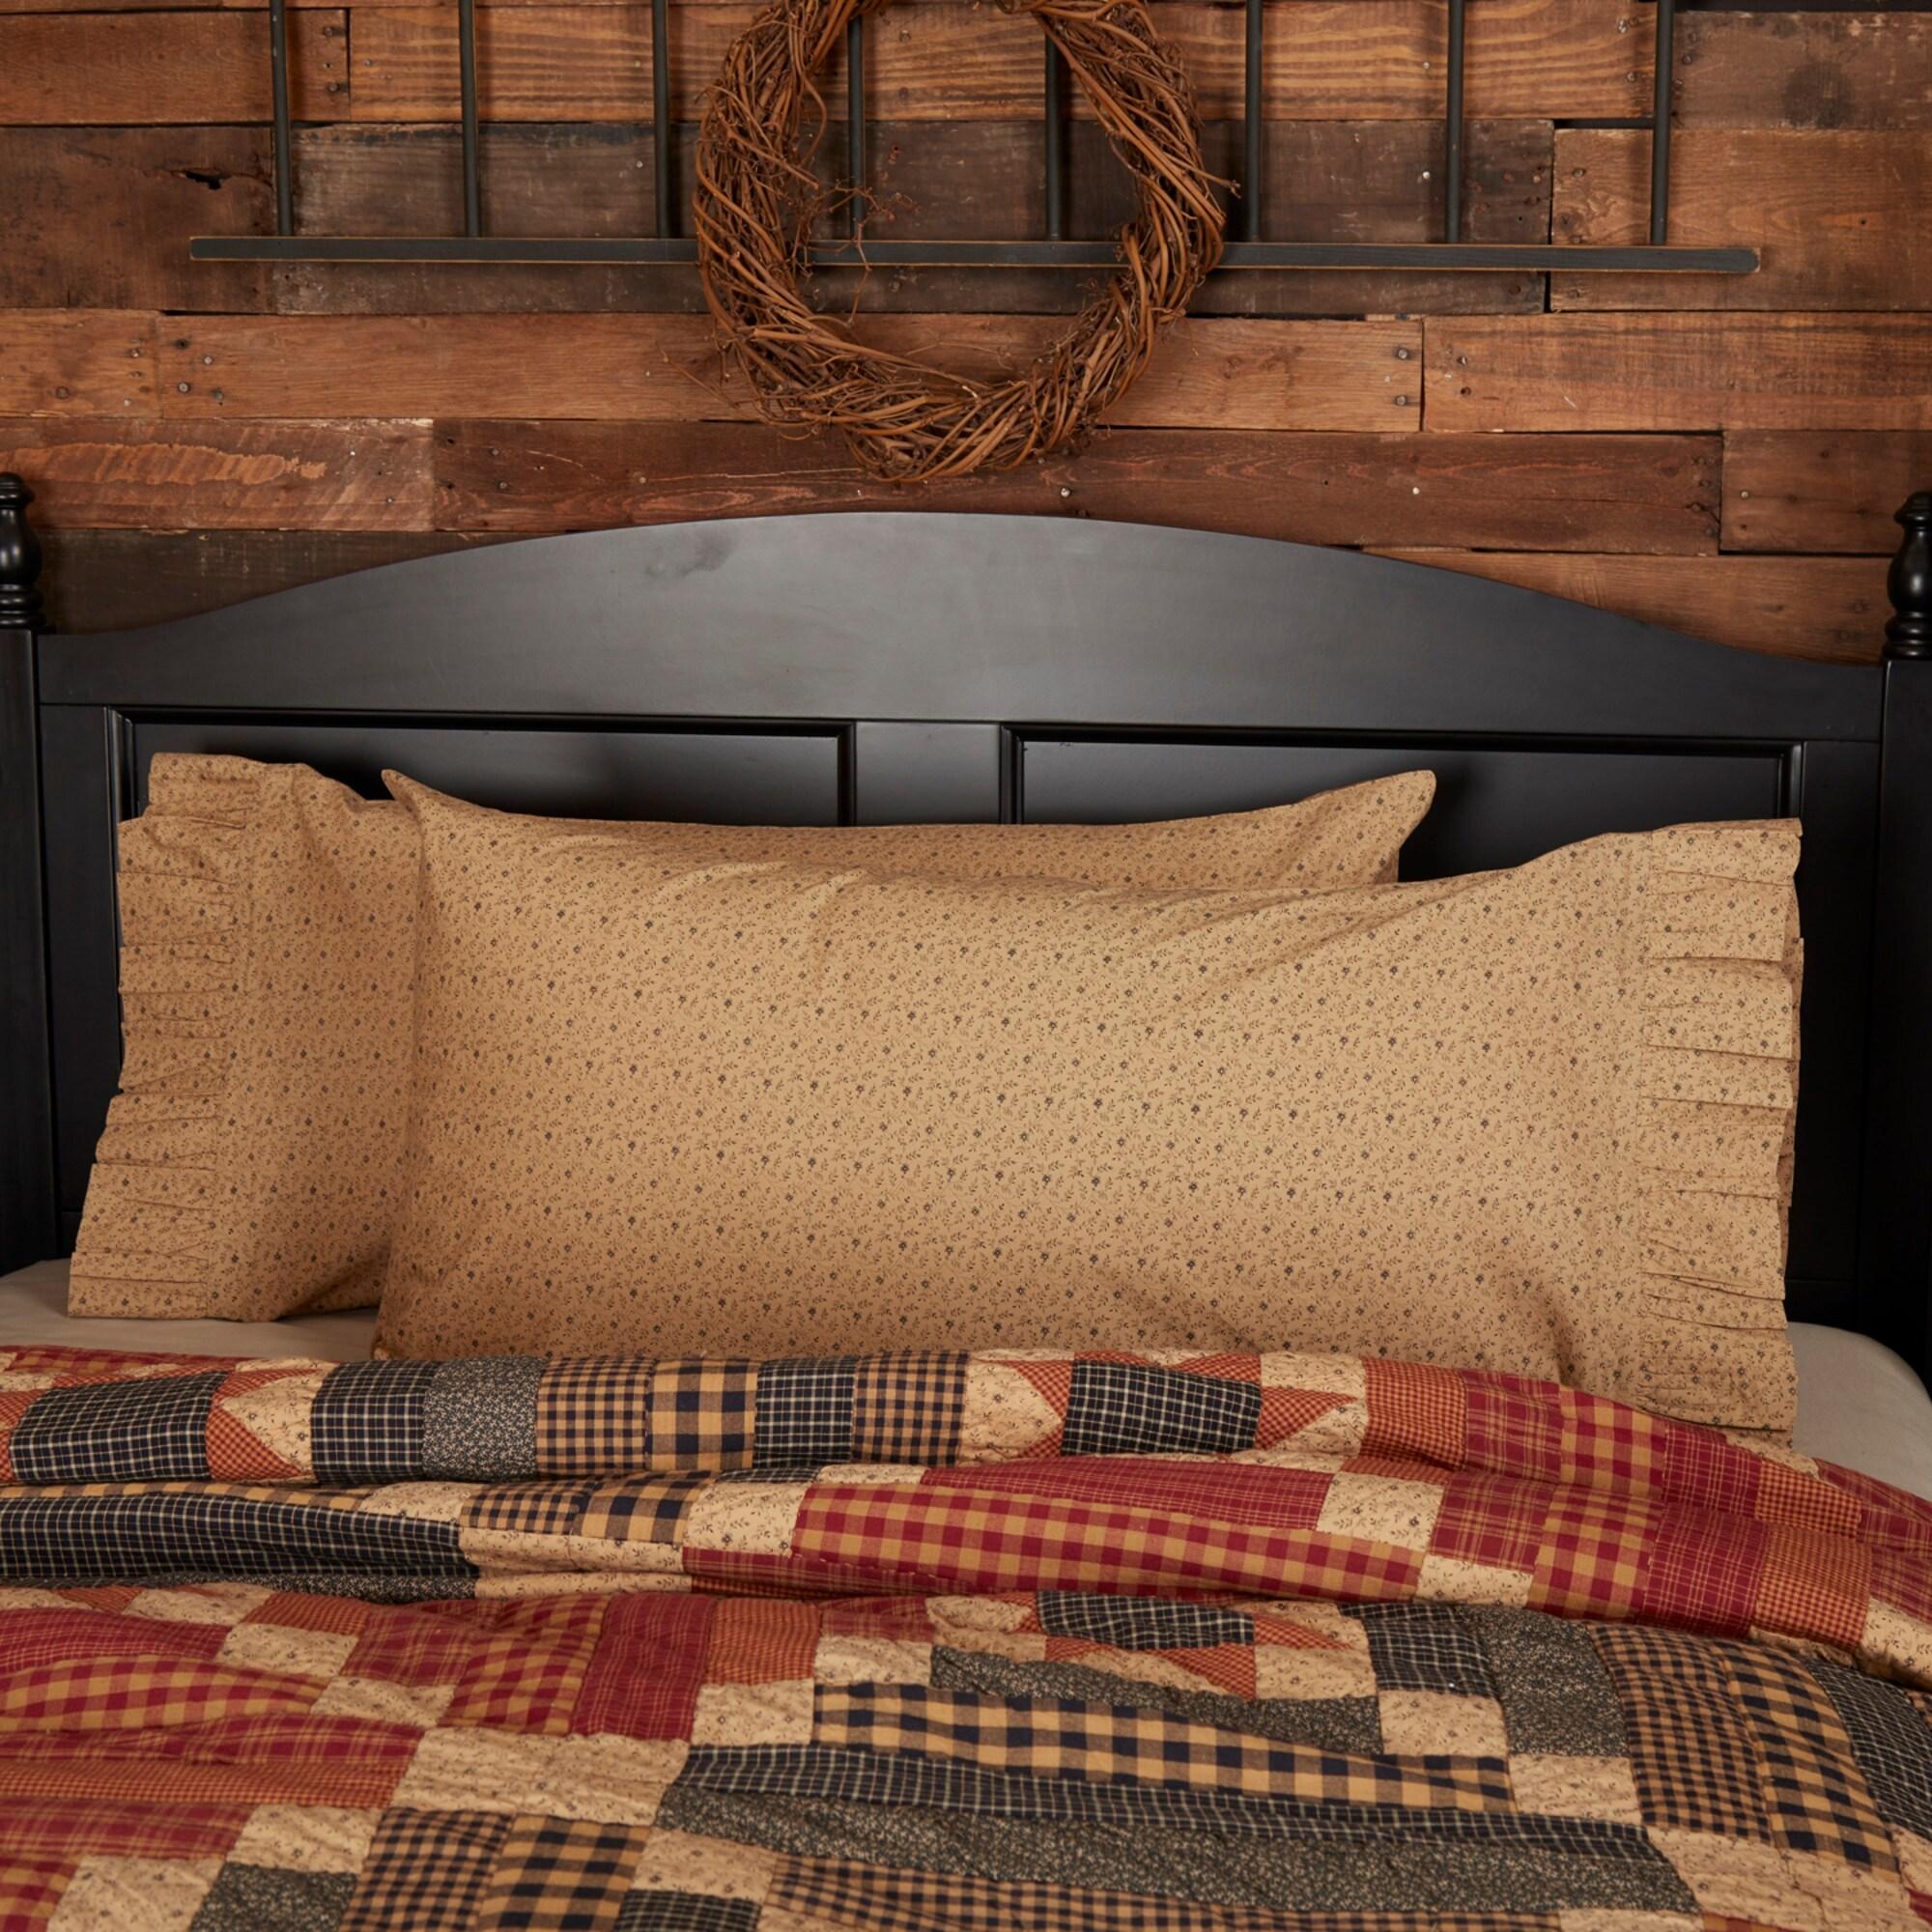 Maisie Pillow Case Set Overstock 28601861 King